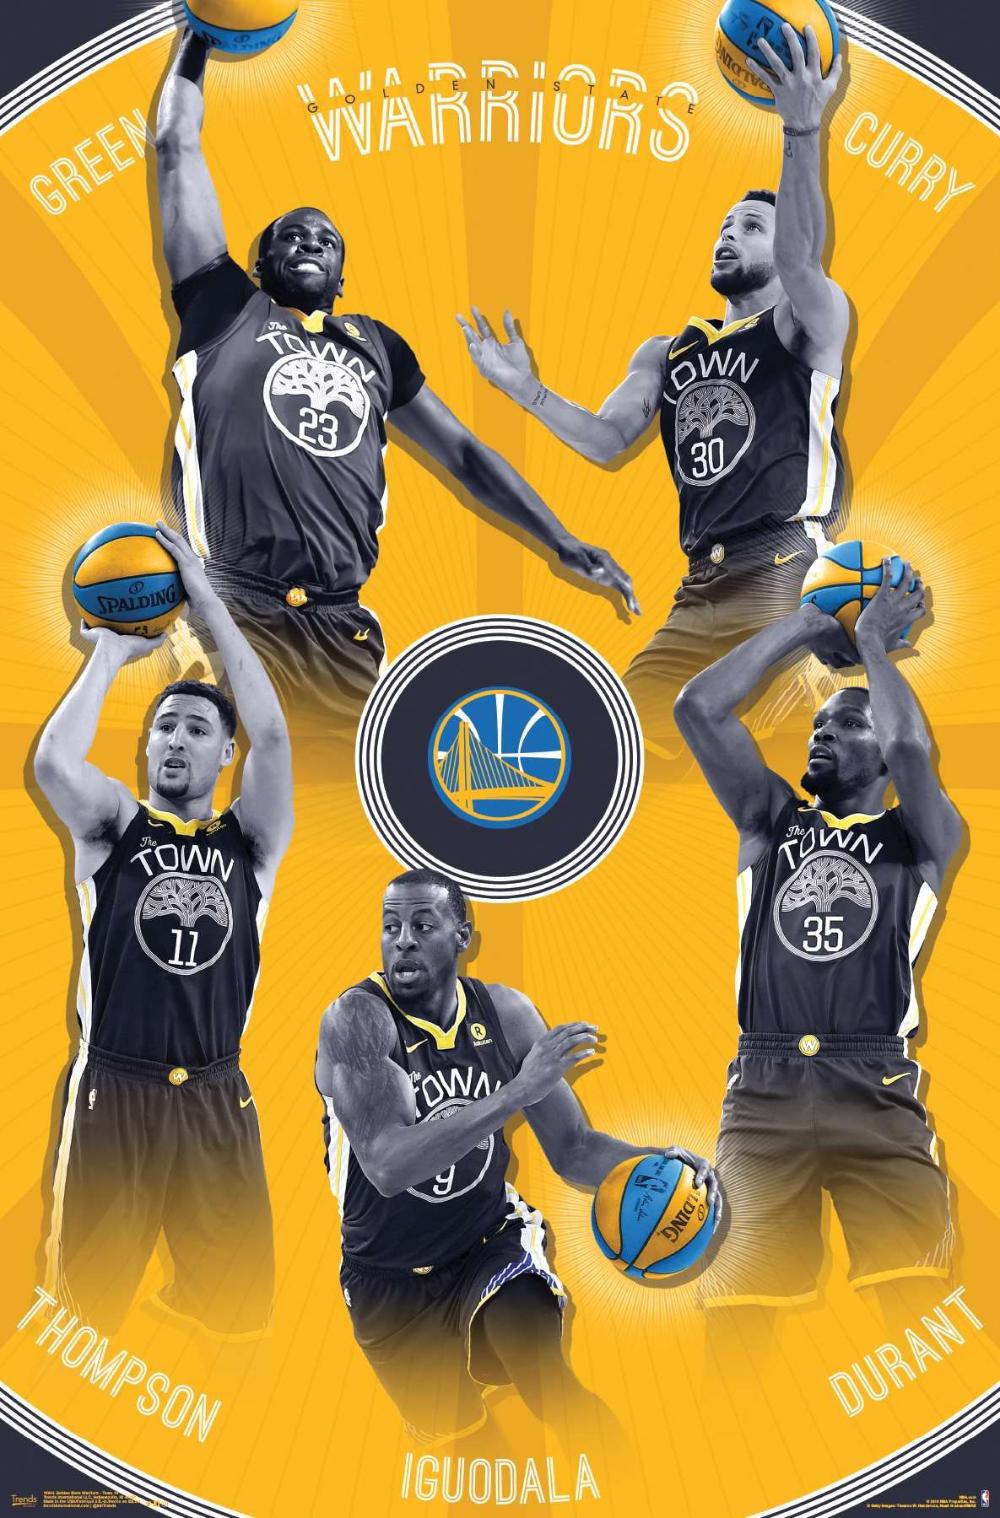 Nba Golden State Warriors Team 18 Golden State Warriors Wallpaper Golden State Warriors Nba Golden State